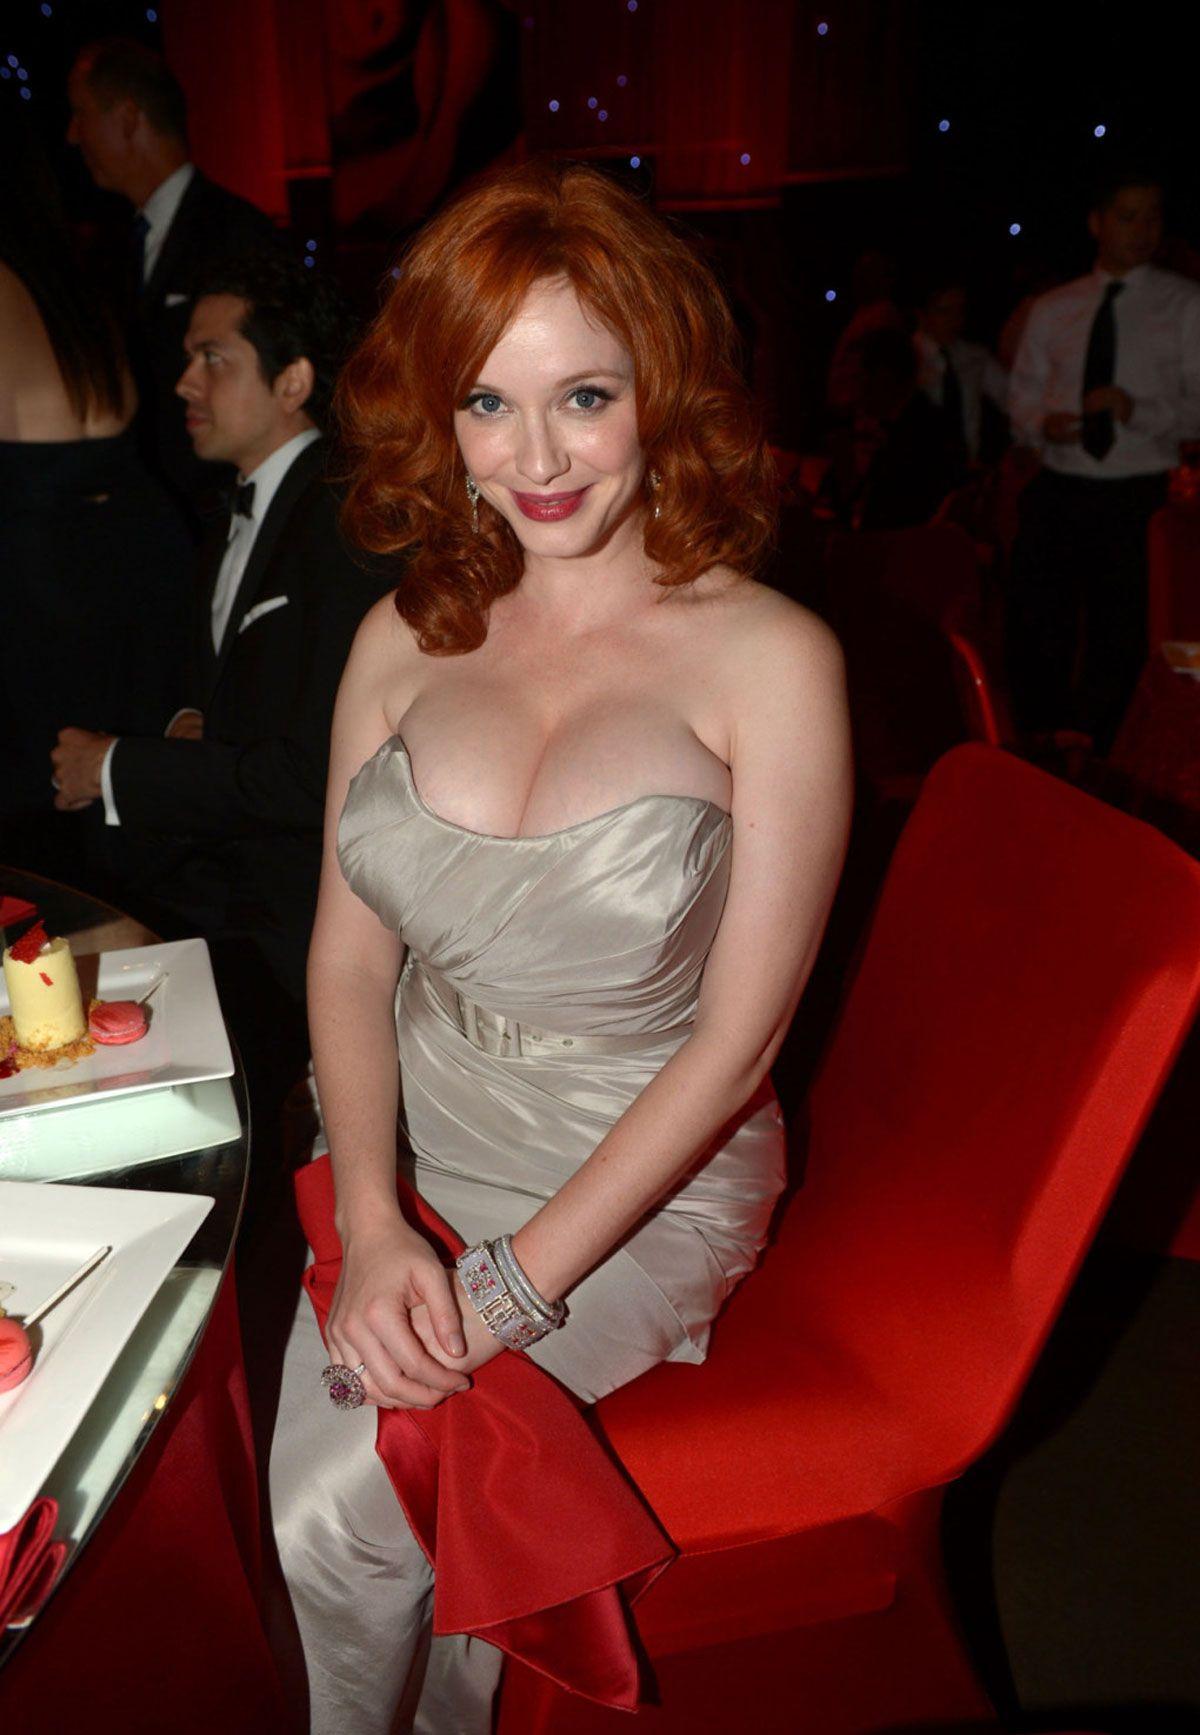 Christina hendricks boob size